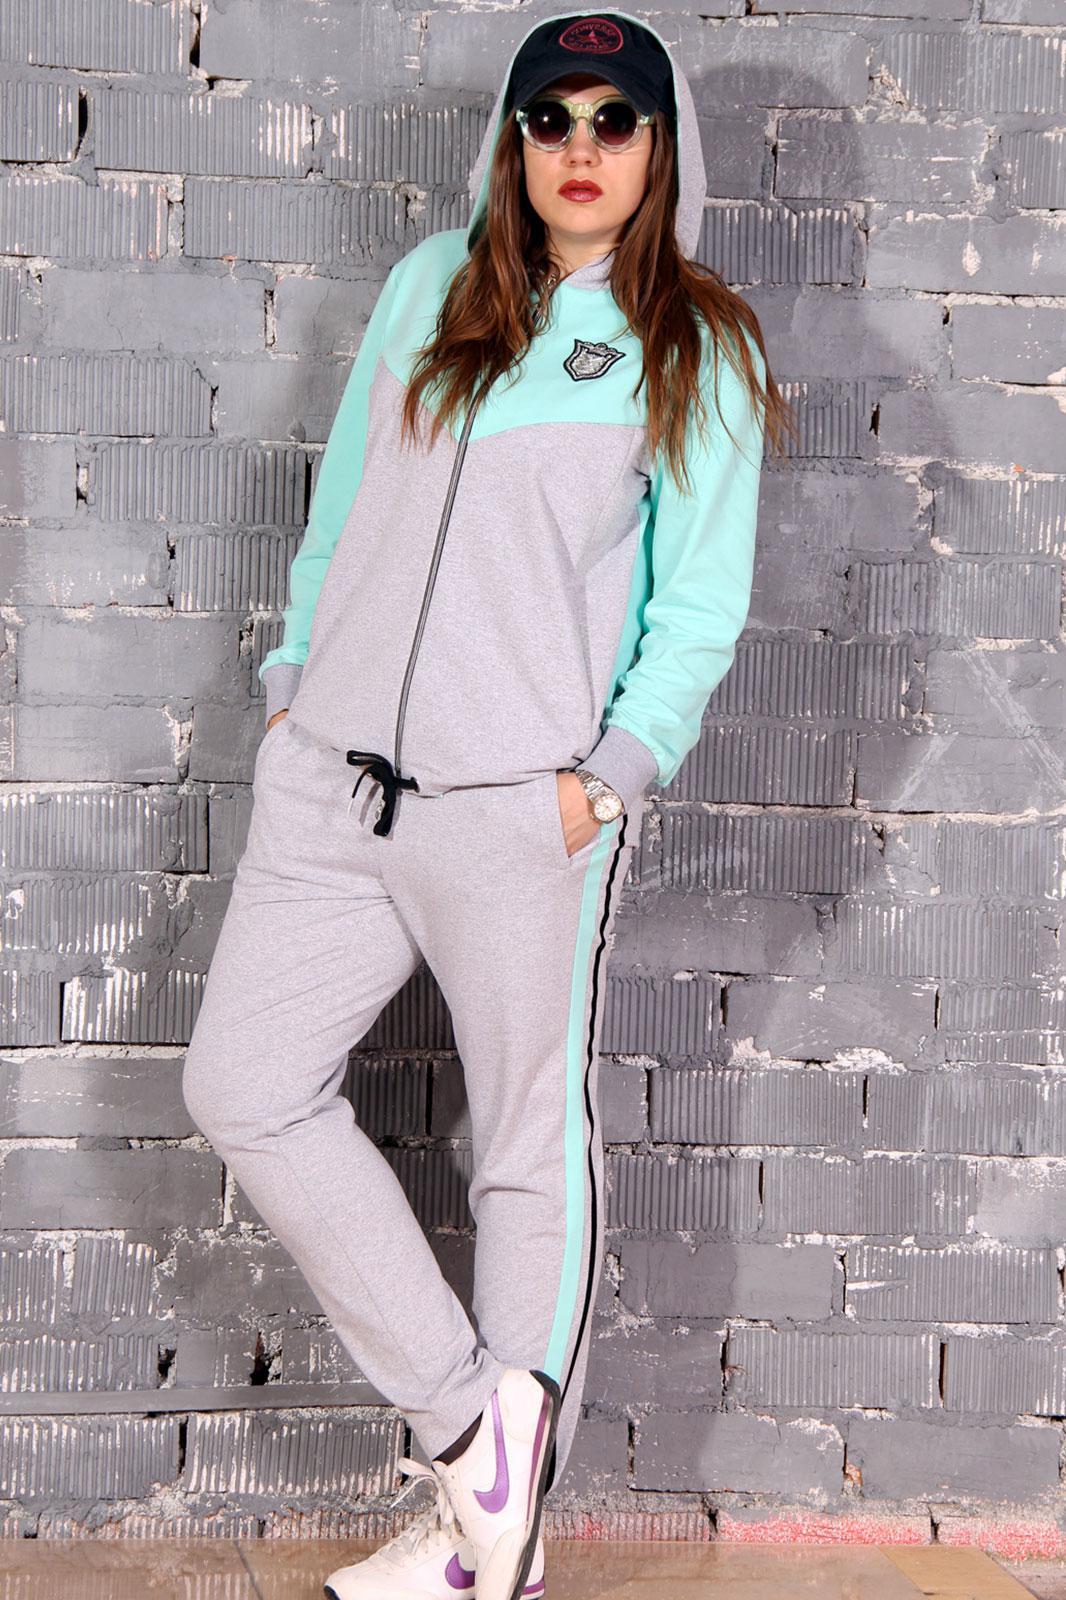 Спортивный костюм Runella 1347 серый+мята - фото 1